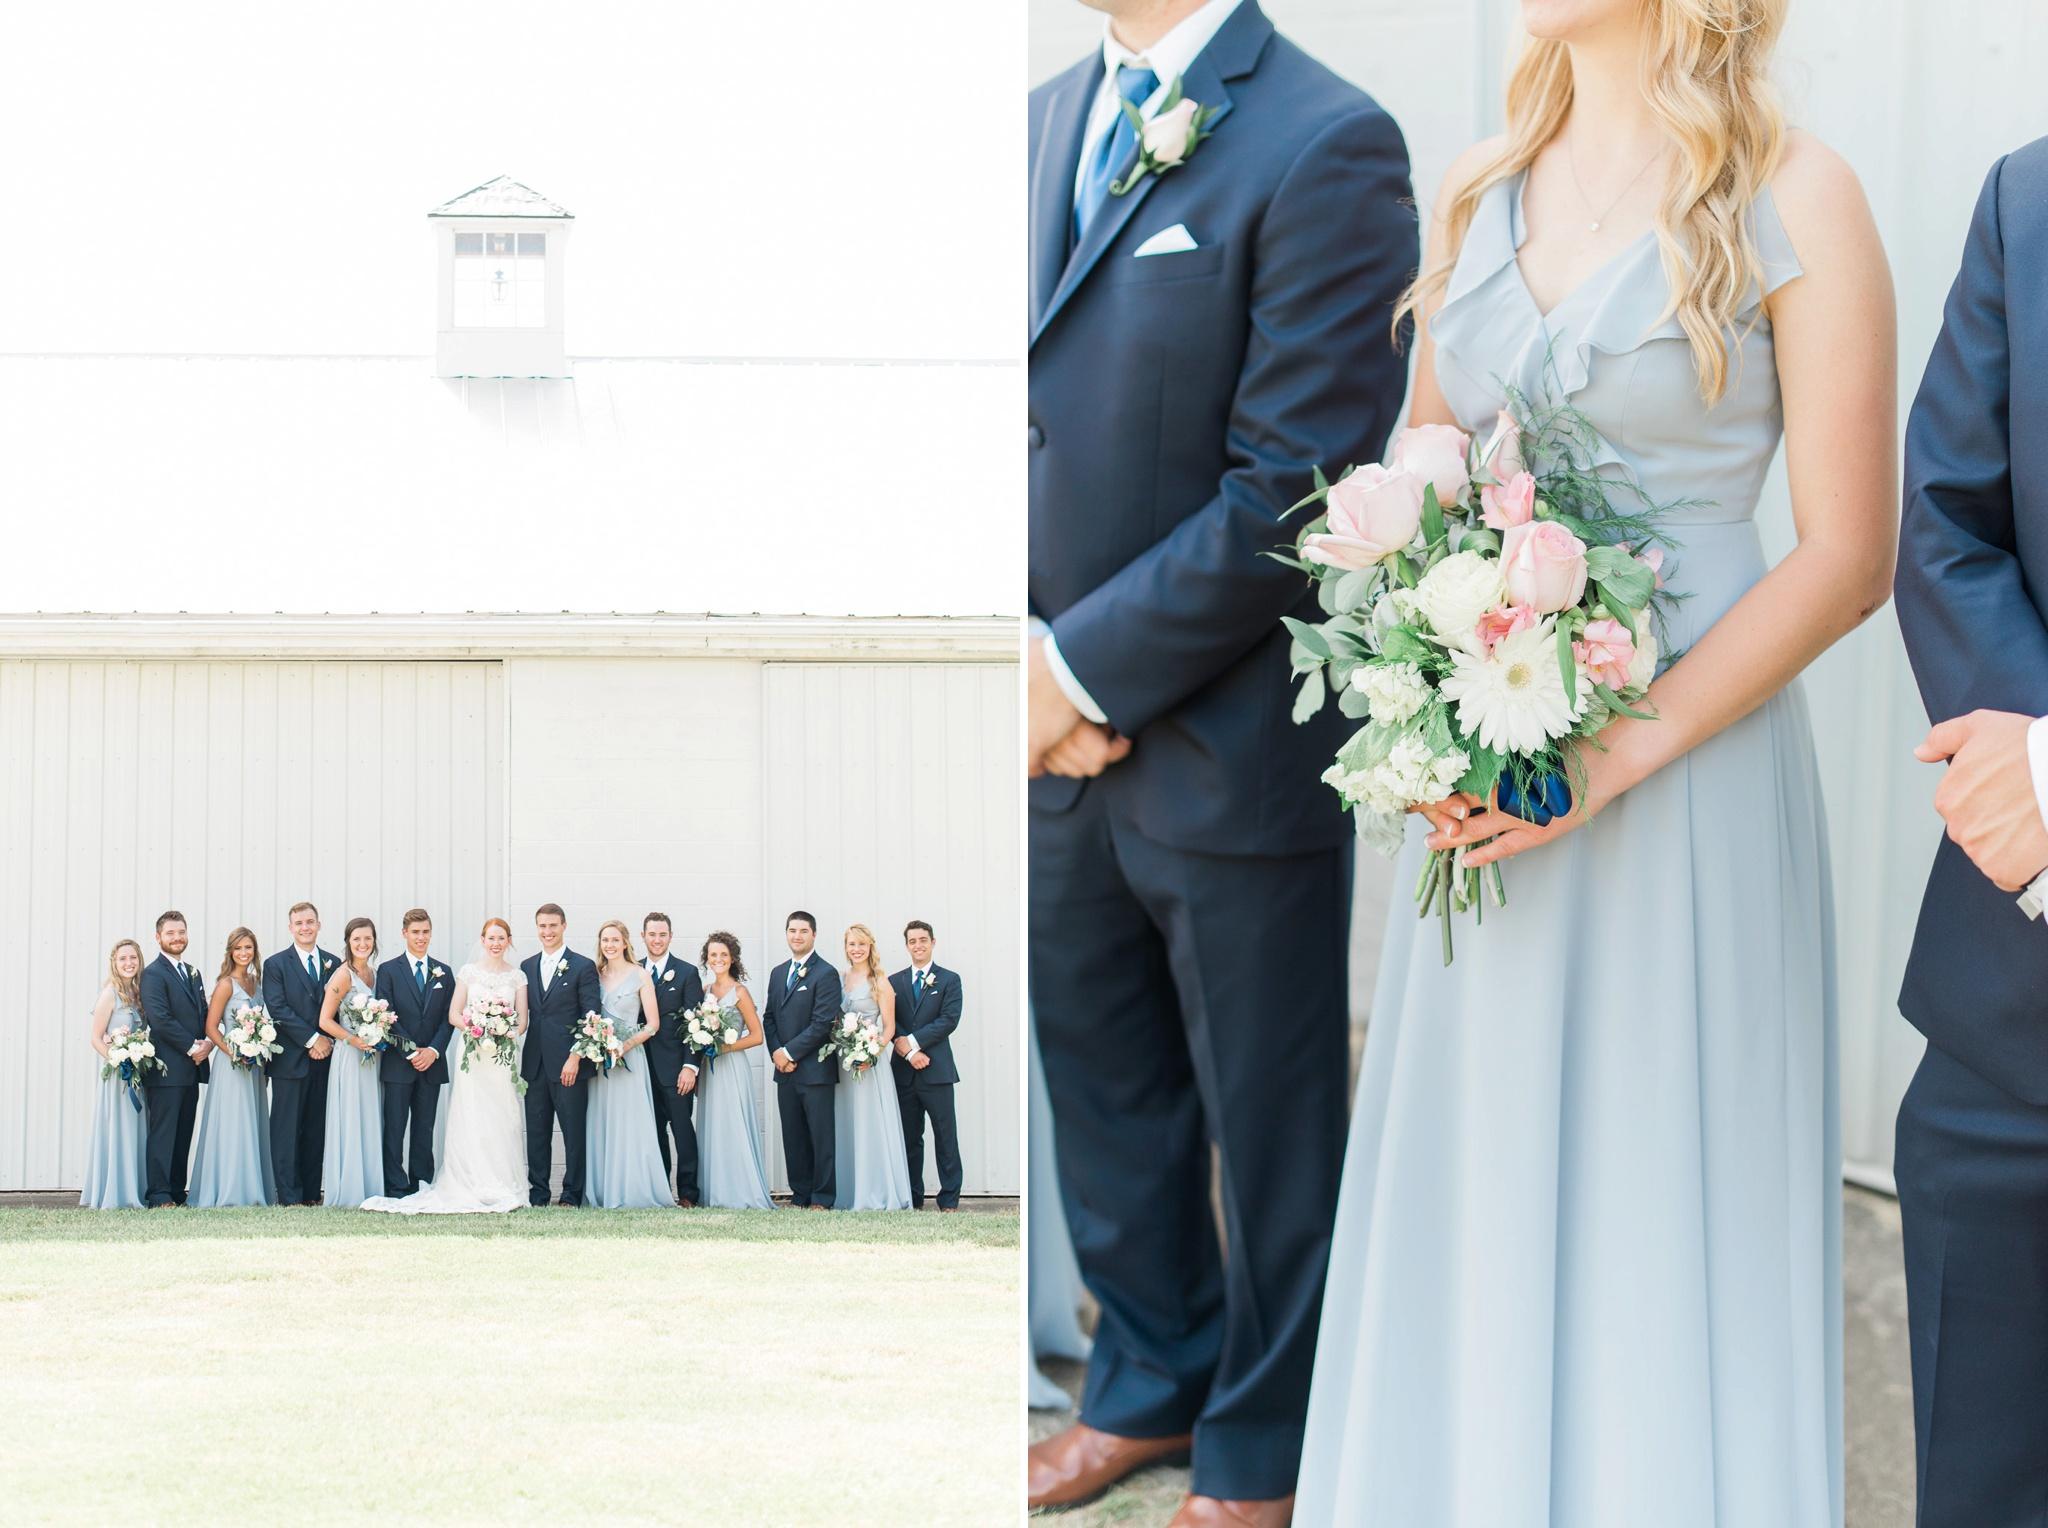 sunbury-ohio-wedding-hannah-johnathan_0071.jpg